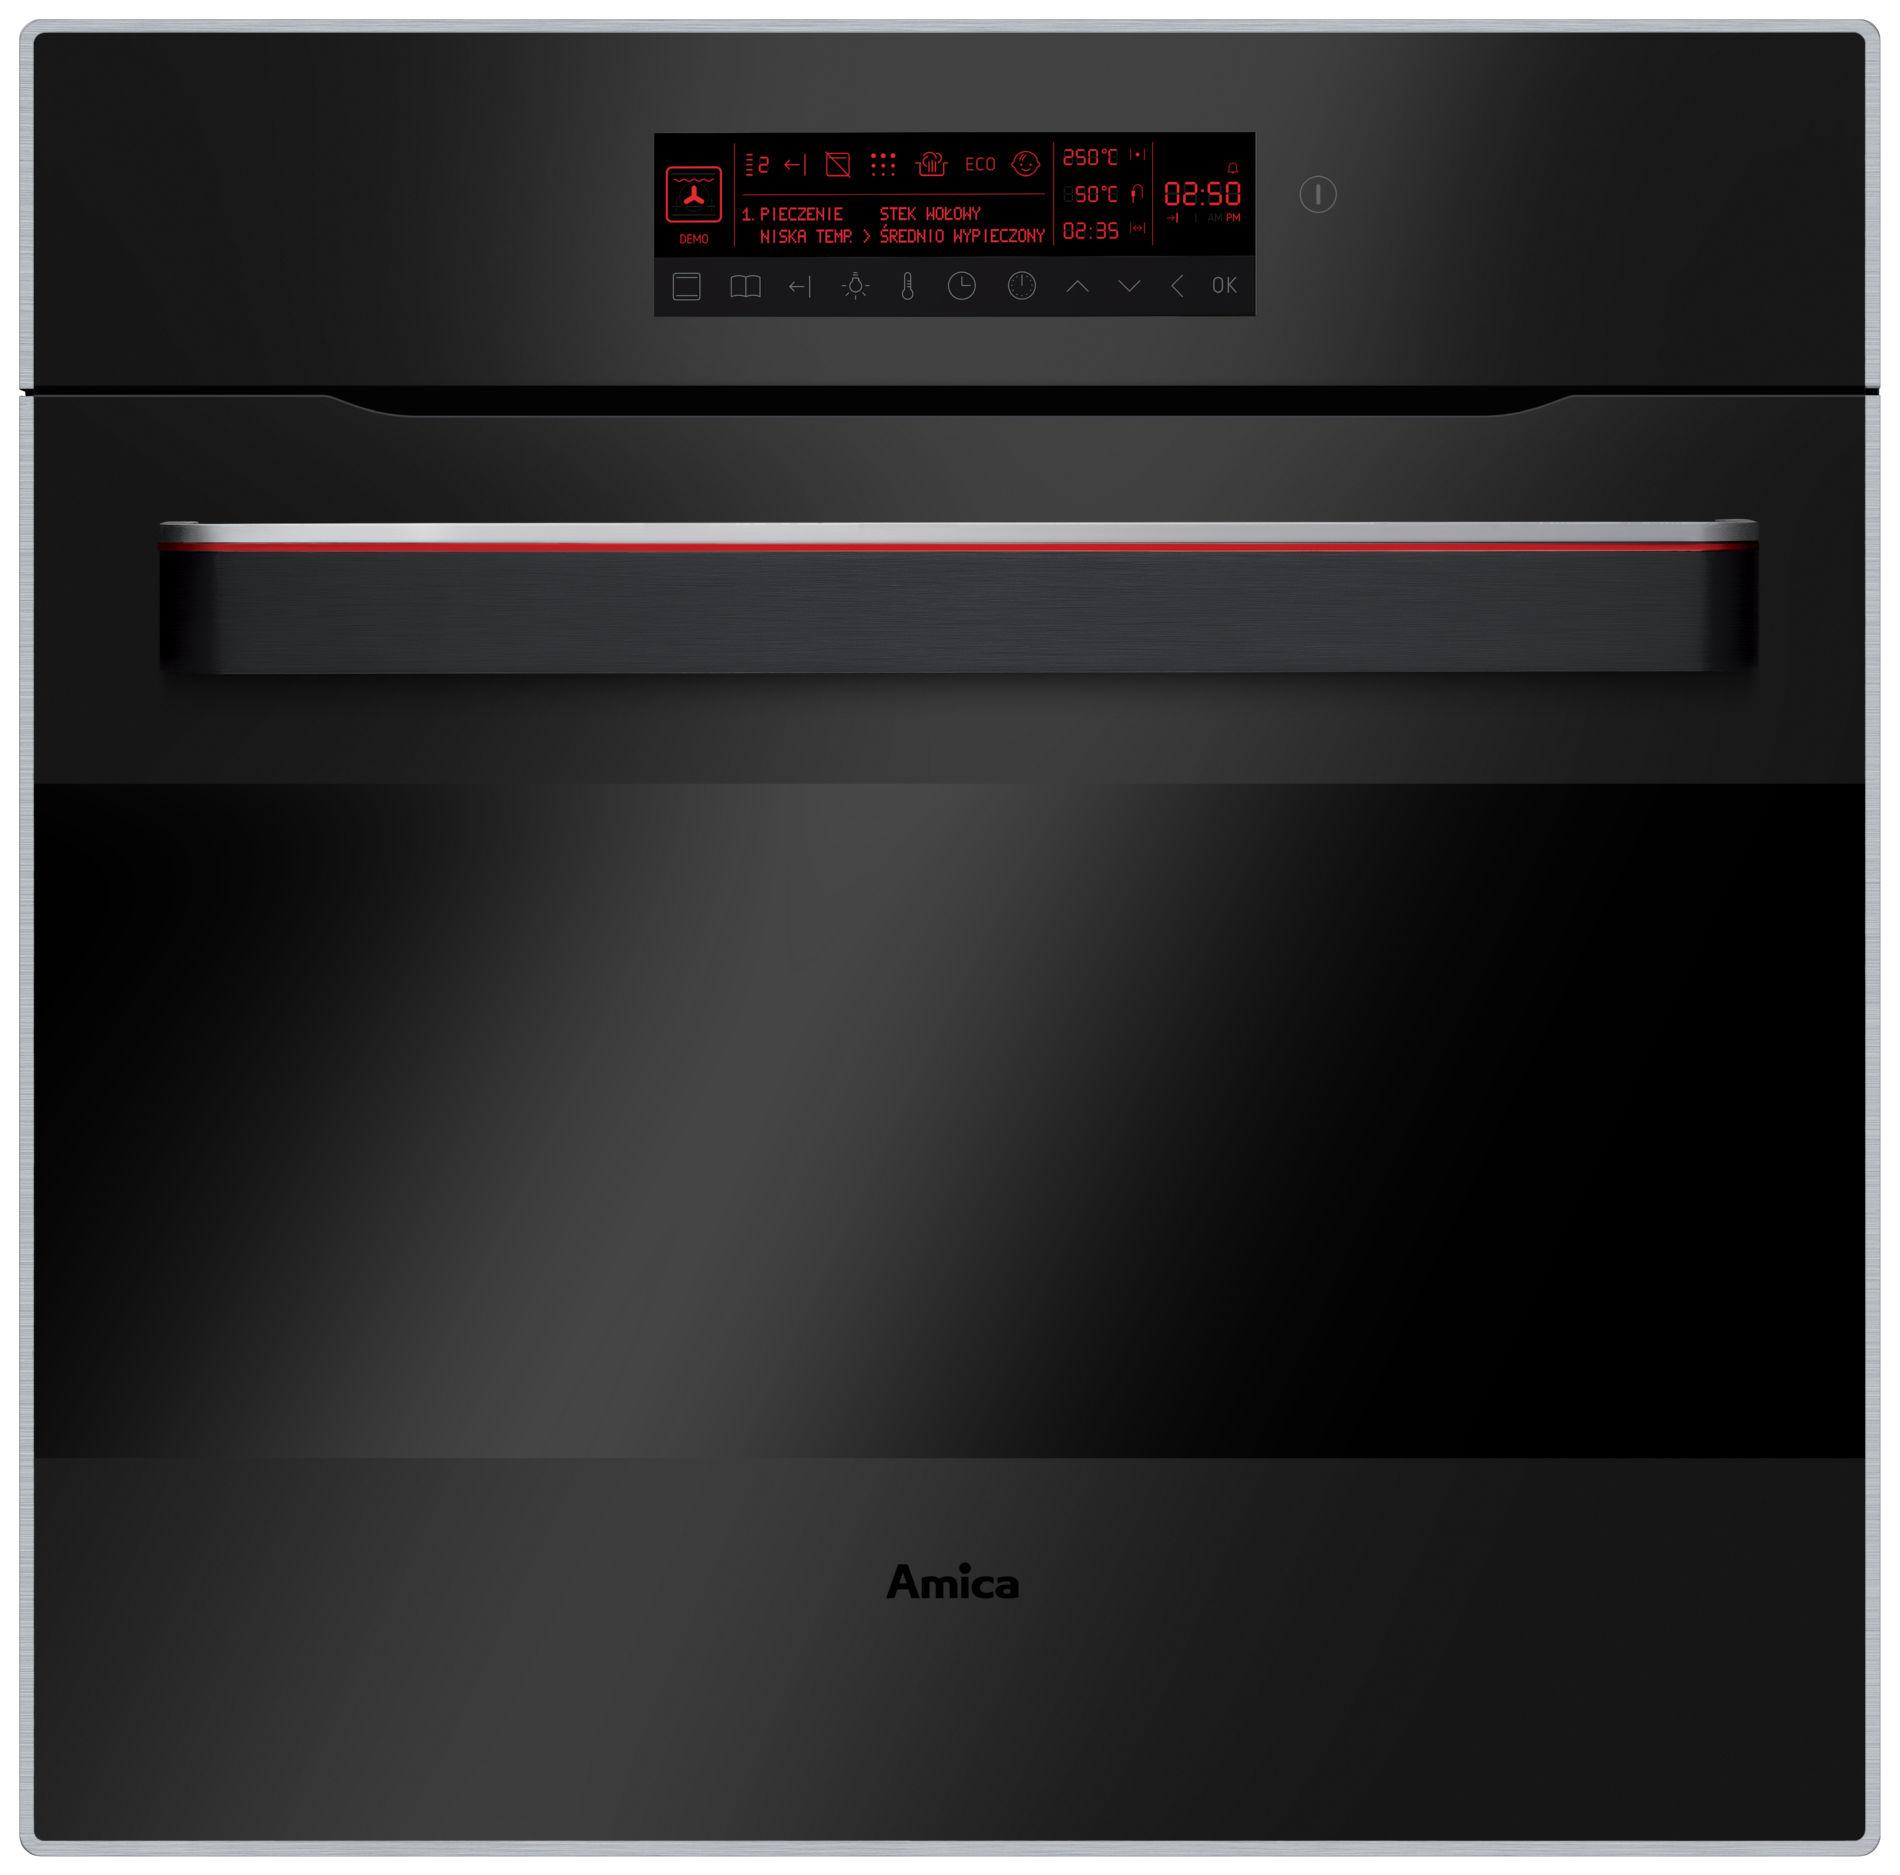 2 x Adjustable Chrome Oven Shelves Grill Shelf Fits TRICITY BENDIX 345-565mm